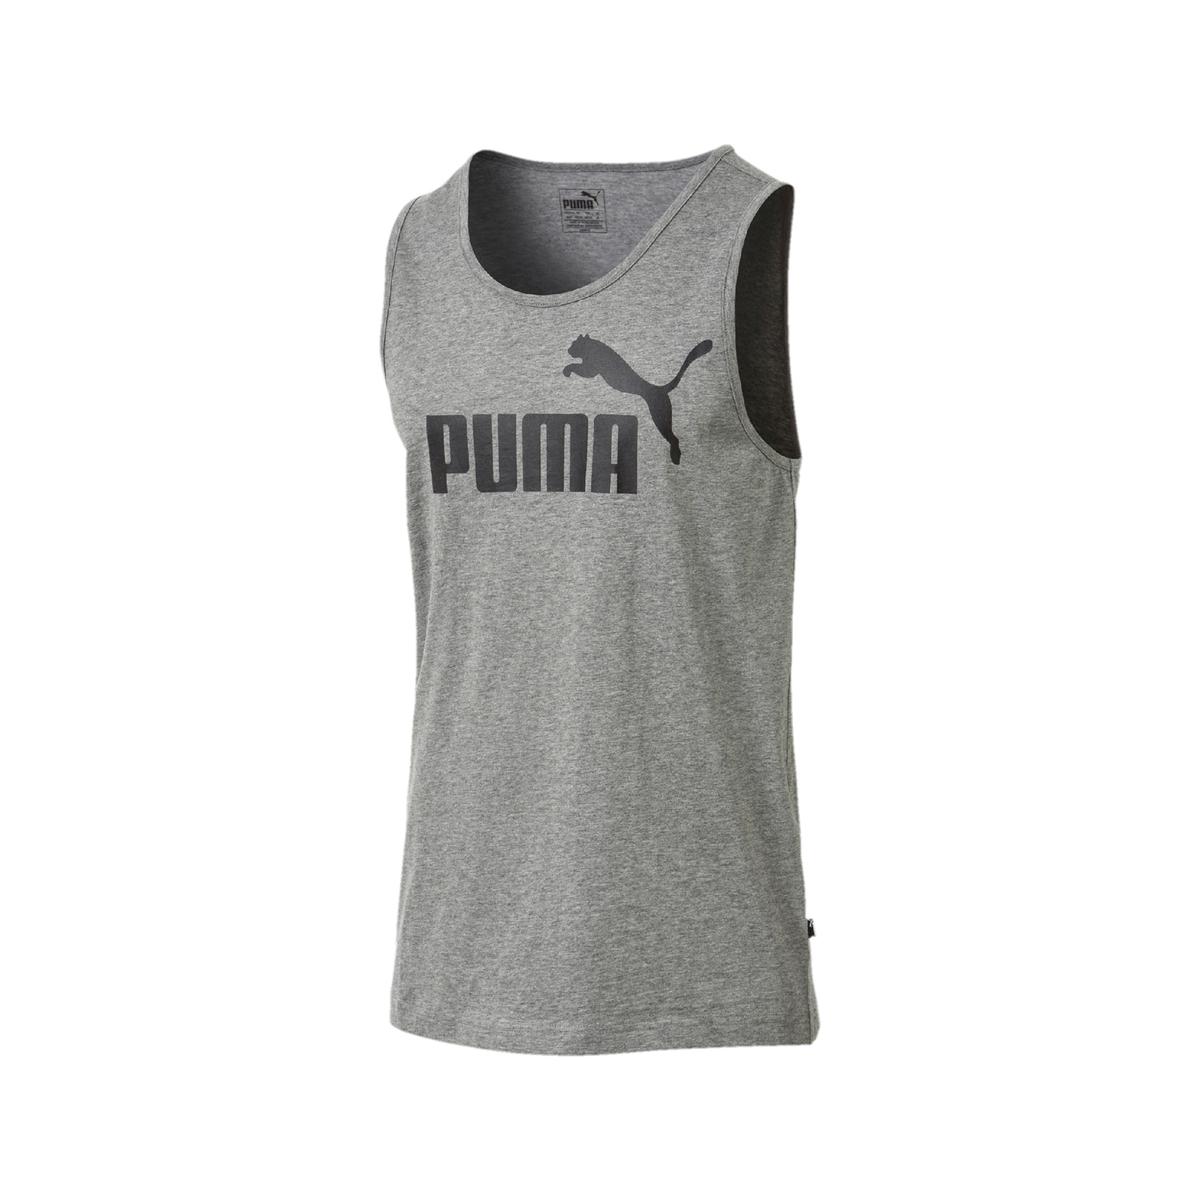 Camiseta sin mangas con logo delante